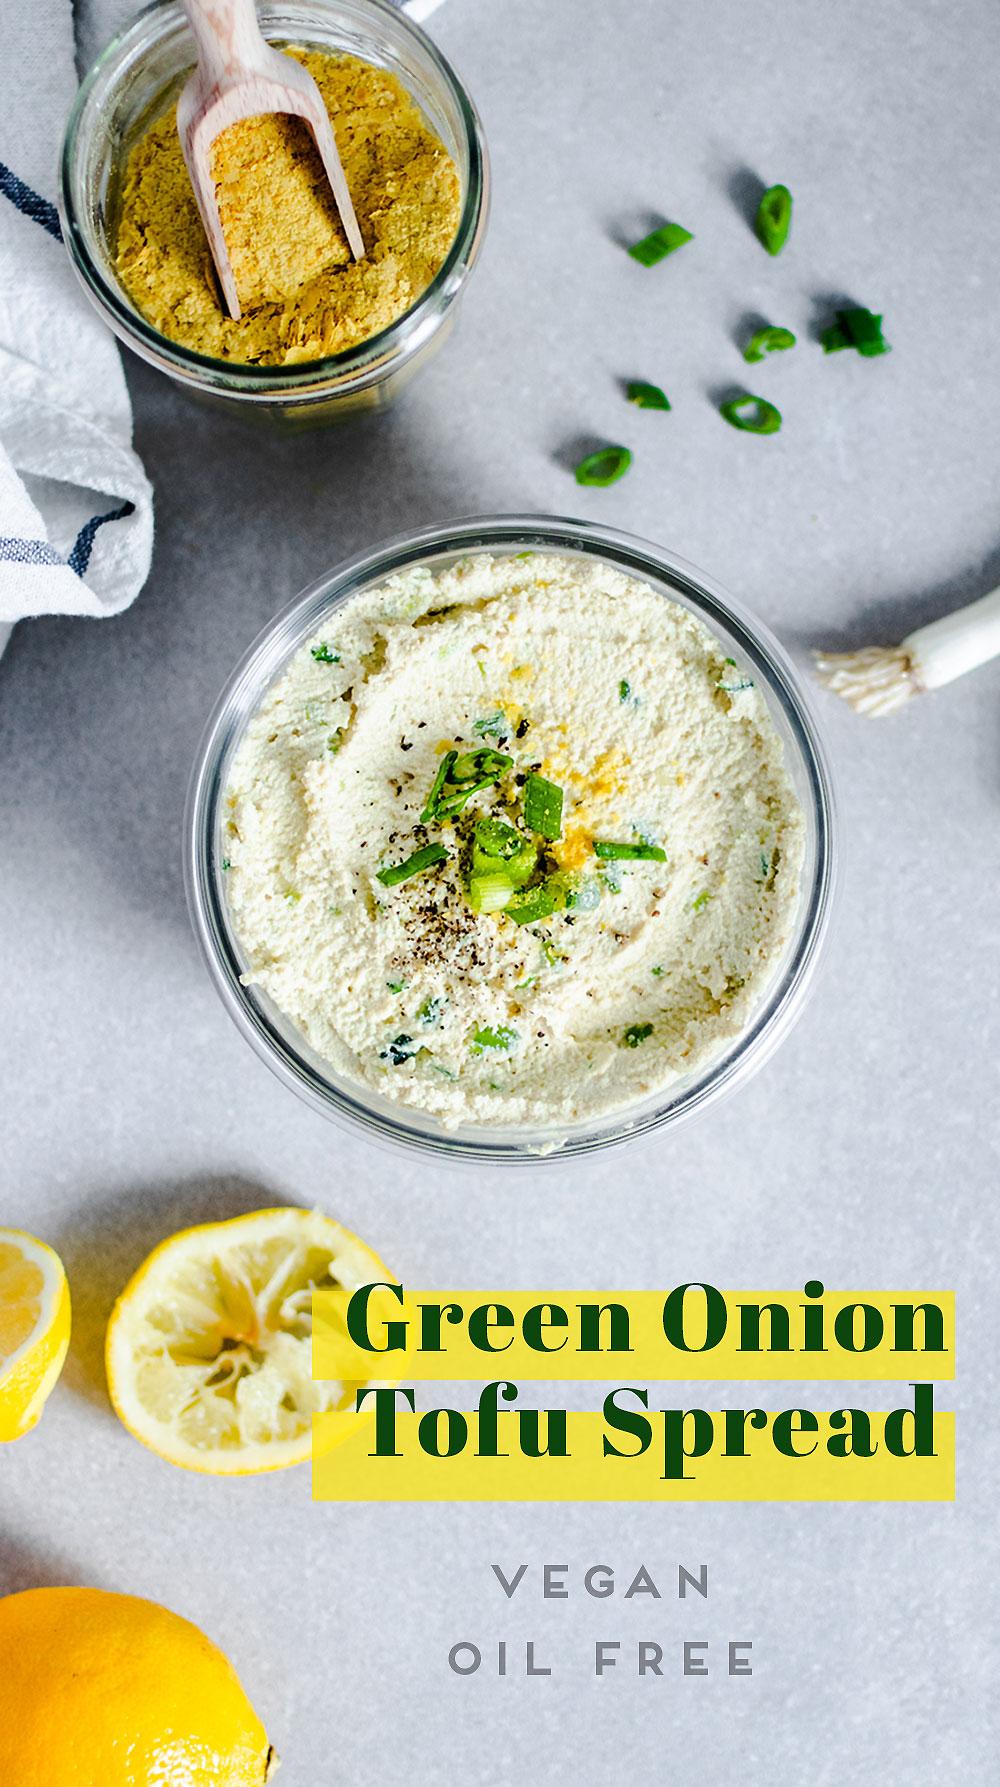 Green Onion Tofu Spread